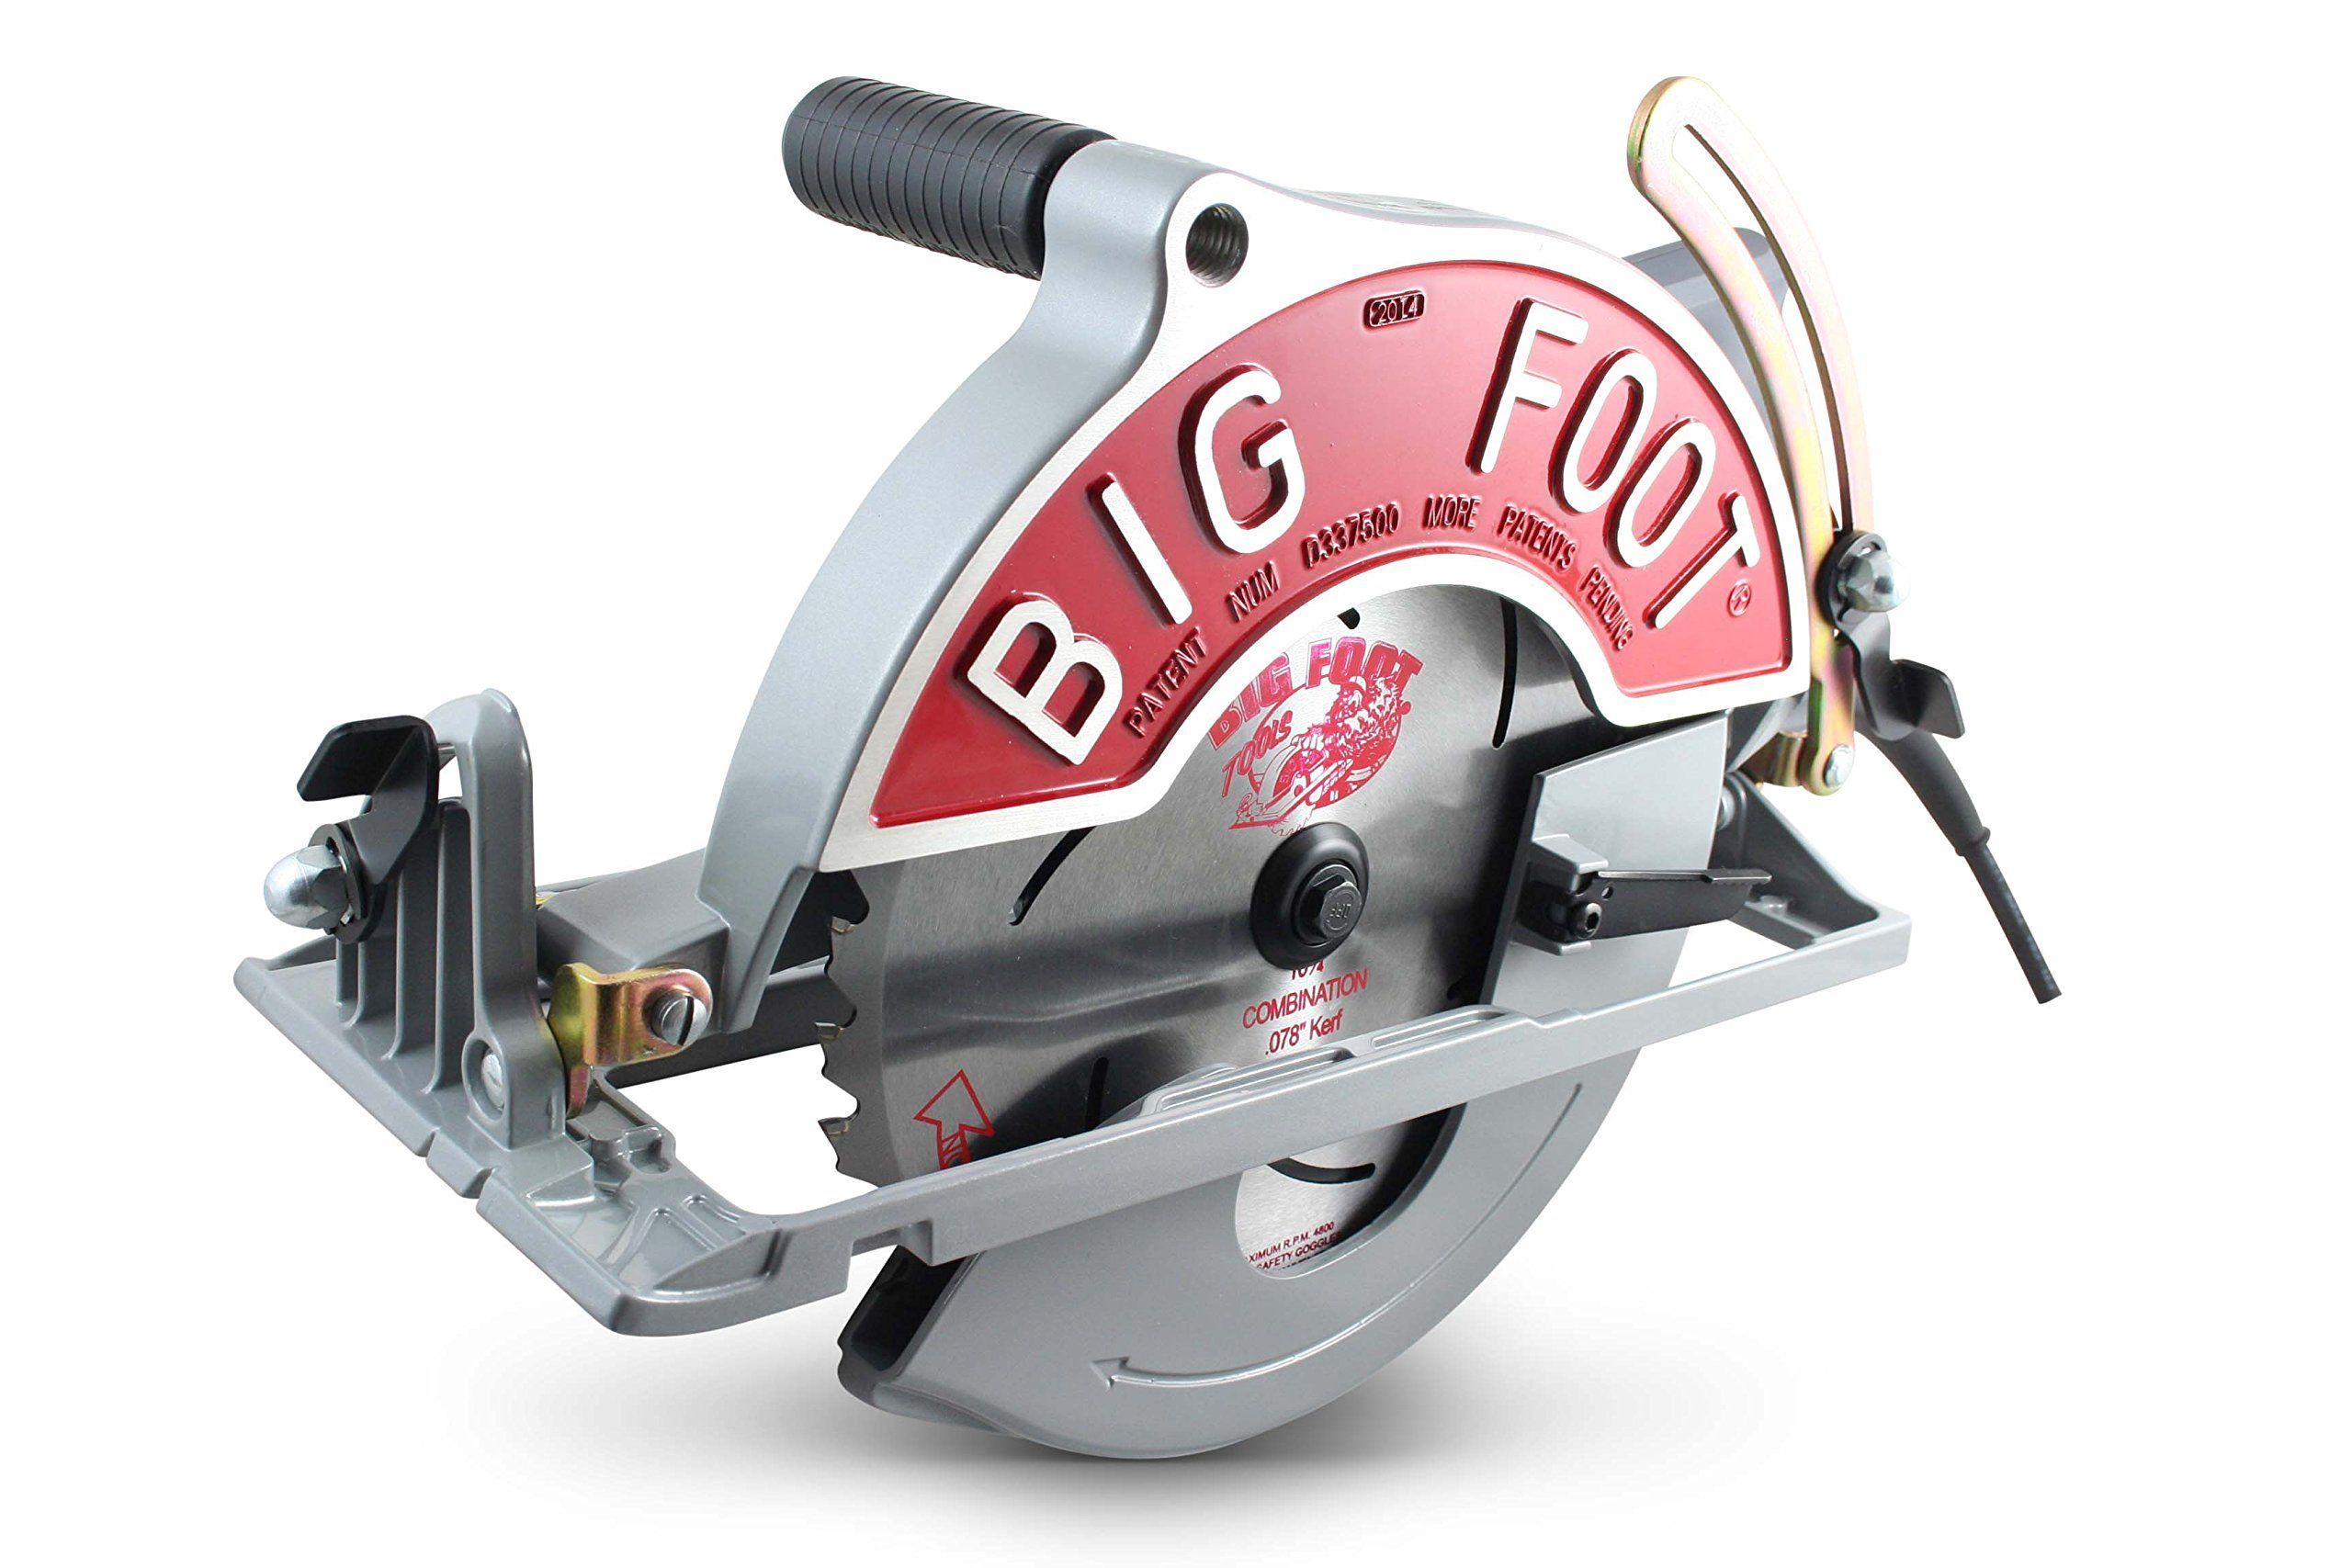 Big Foot Tools Bfug 101 4inch Wormdrive Magnesium Circular Saw W Skil Motor Review More At The Image Web Link This Is An Skil Saw Skill Saw Circular Saw